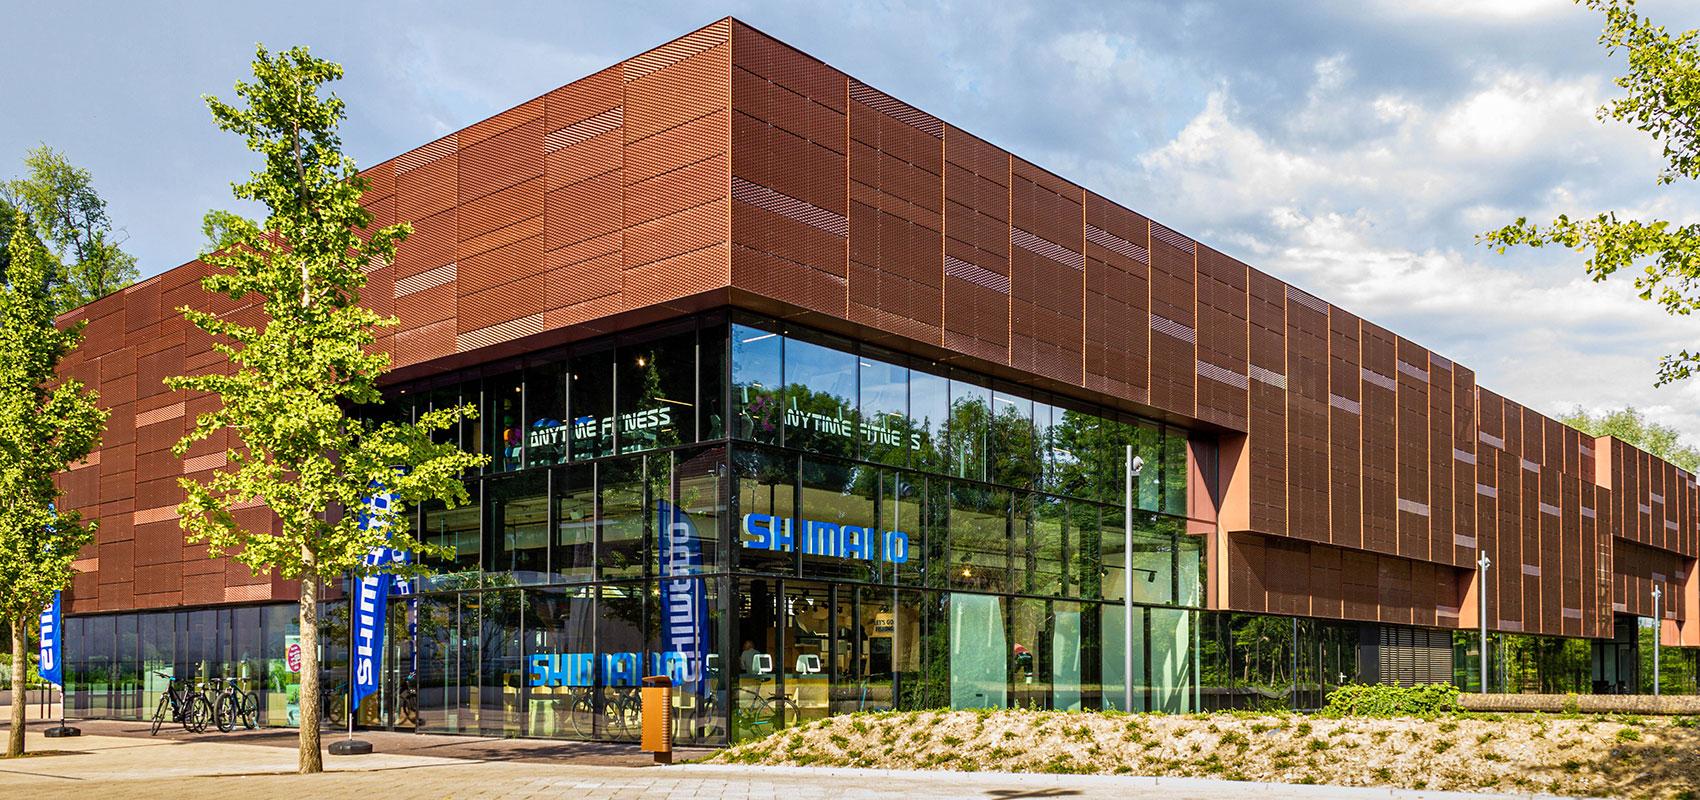 Brand Experience for Shimano in Valkenburg - by Hypsos